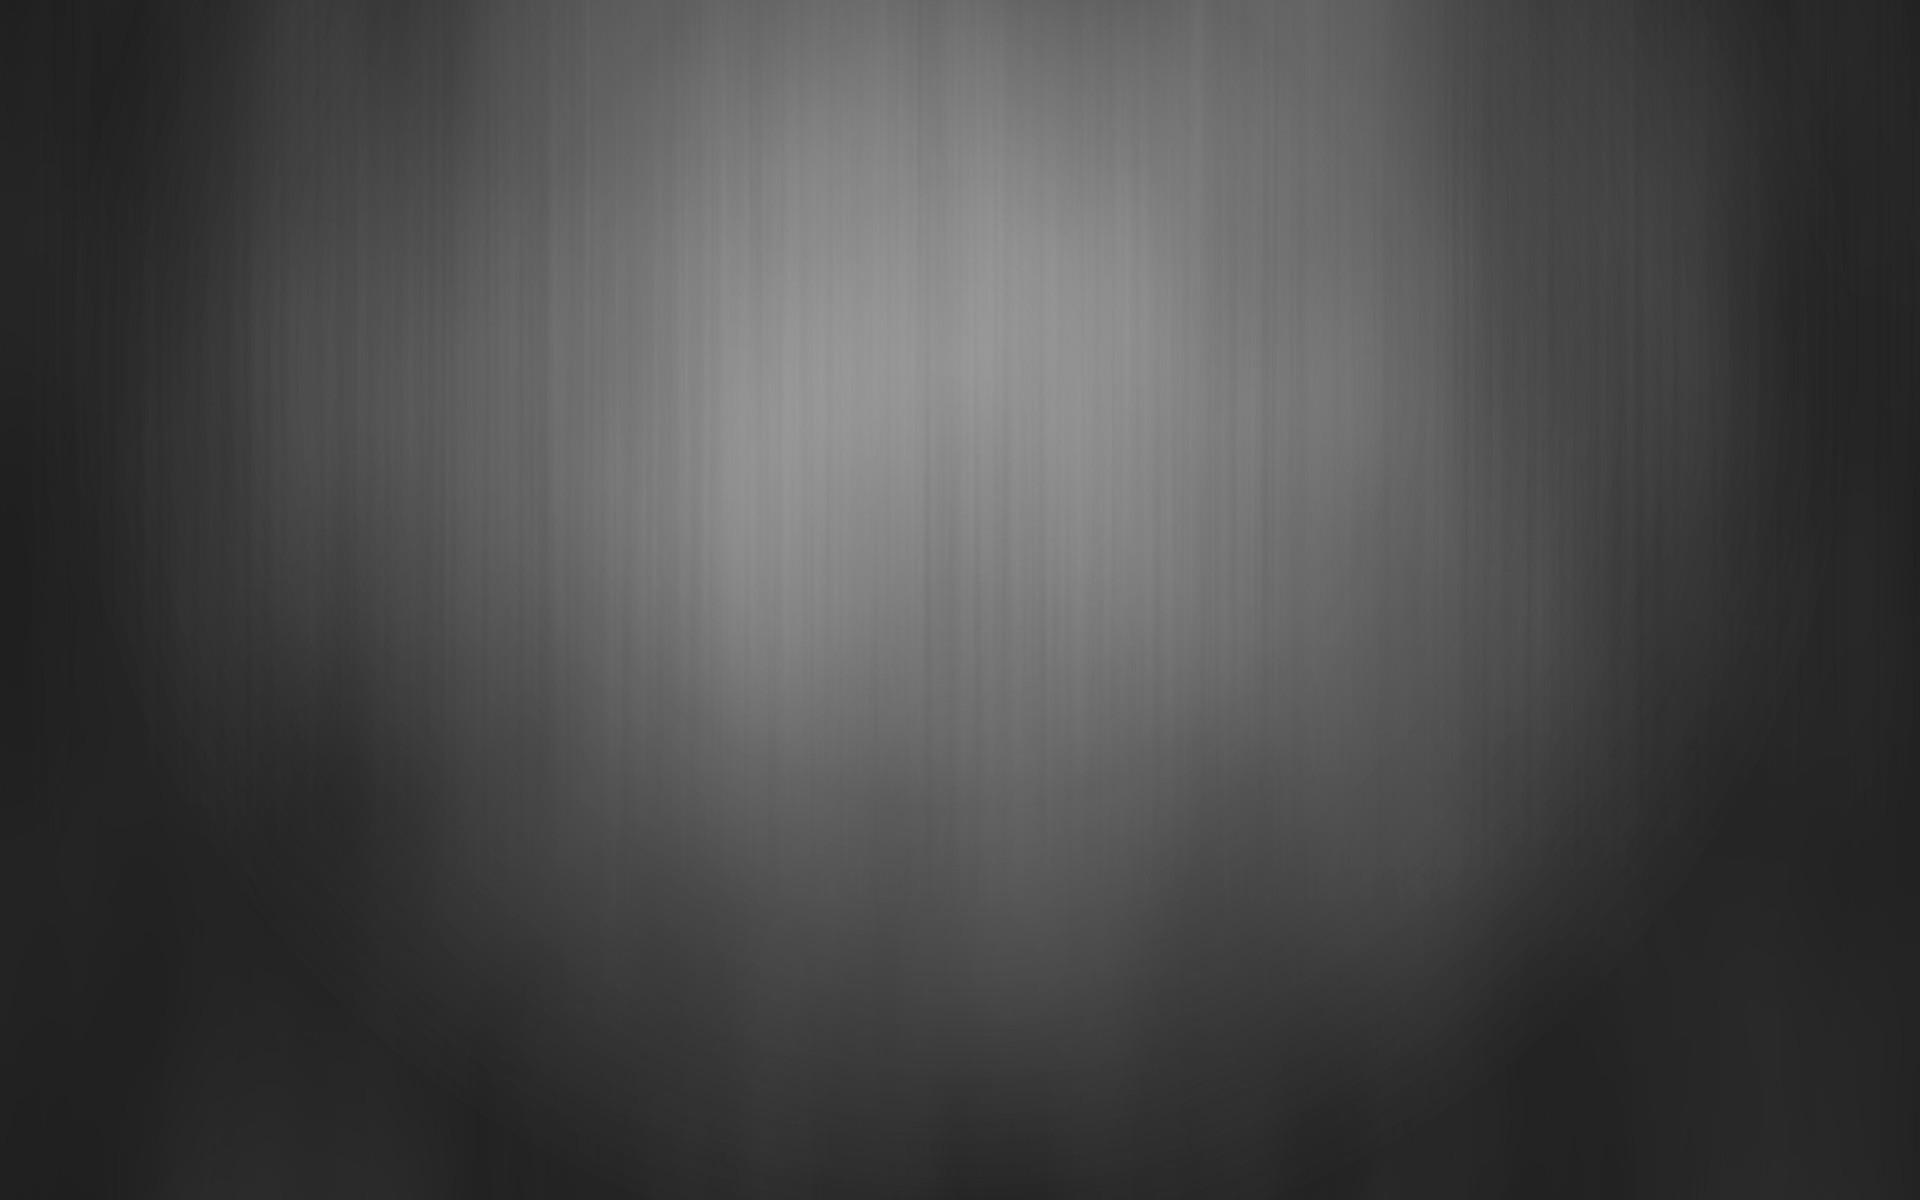 Cool Black Background Wallpaper (65+ Images